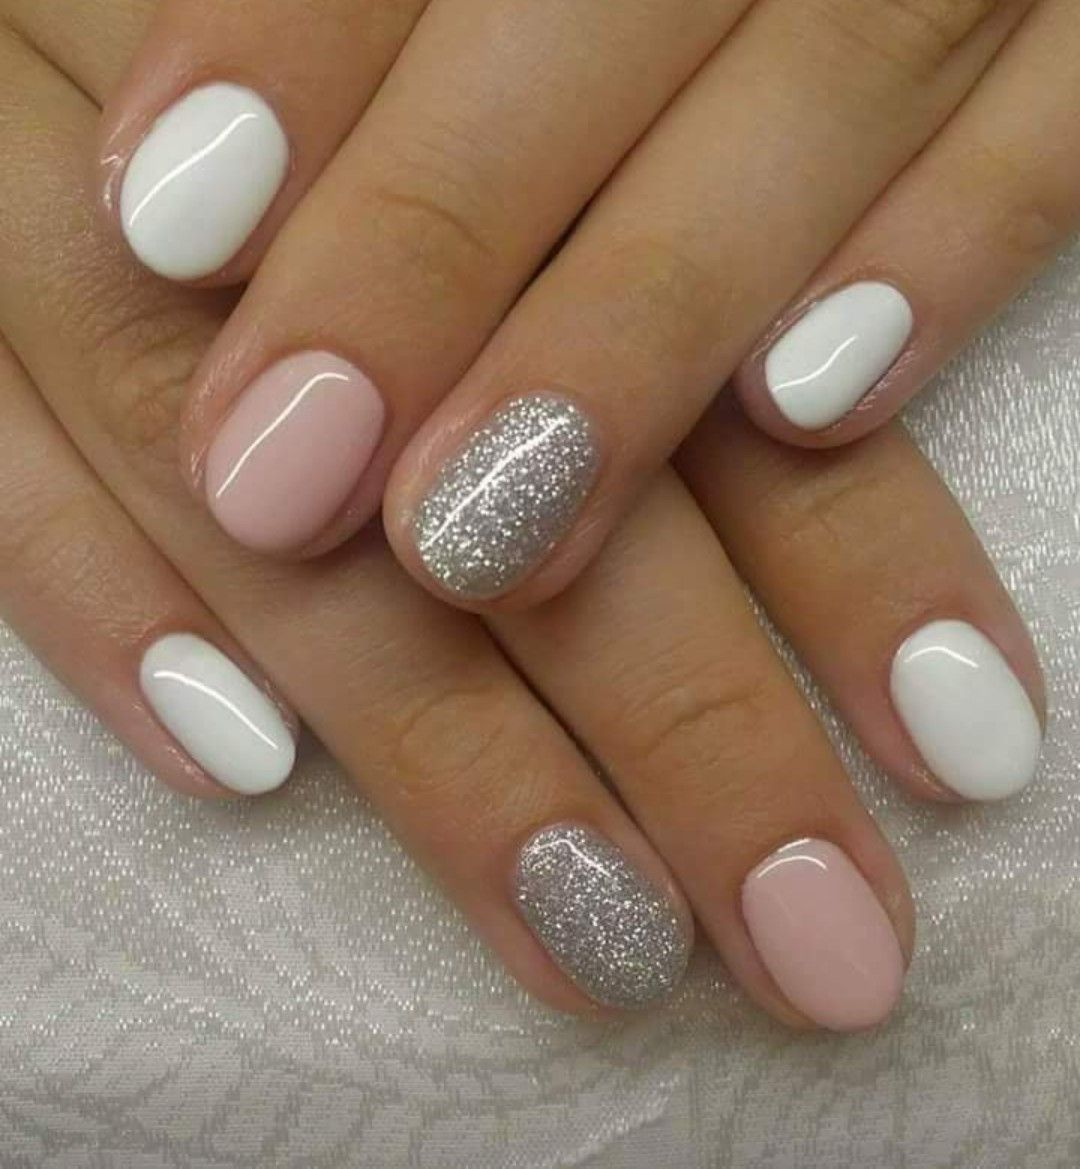 So Pretty Simple And Classy Glitter Nail Art Manicure Shellac Nails